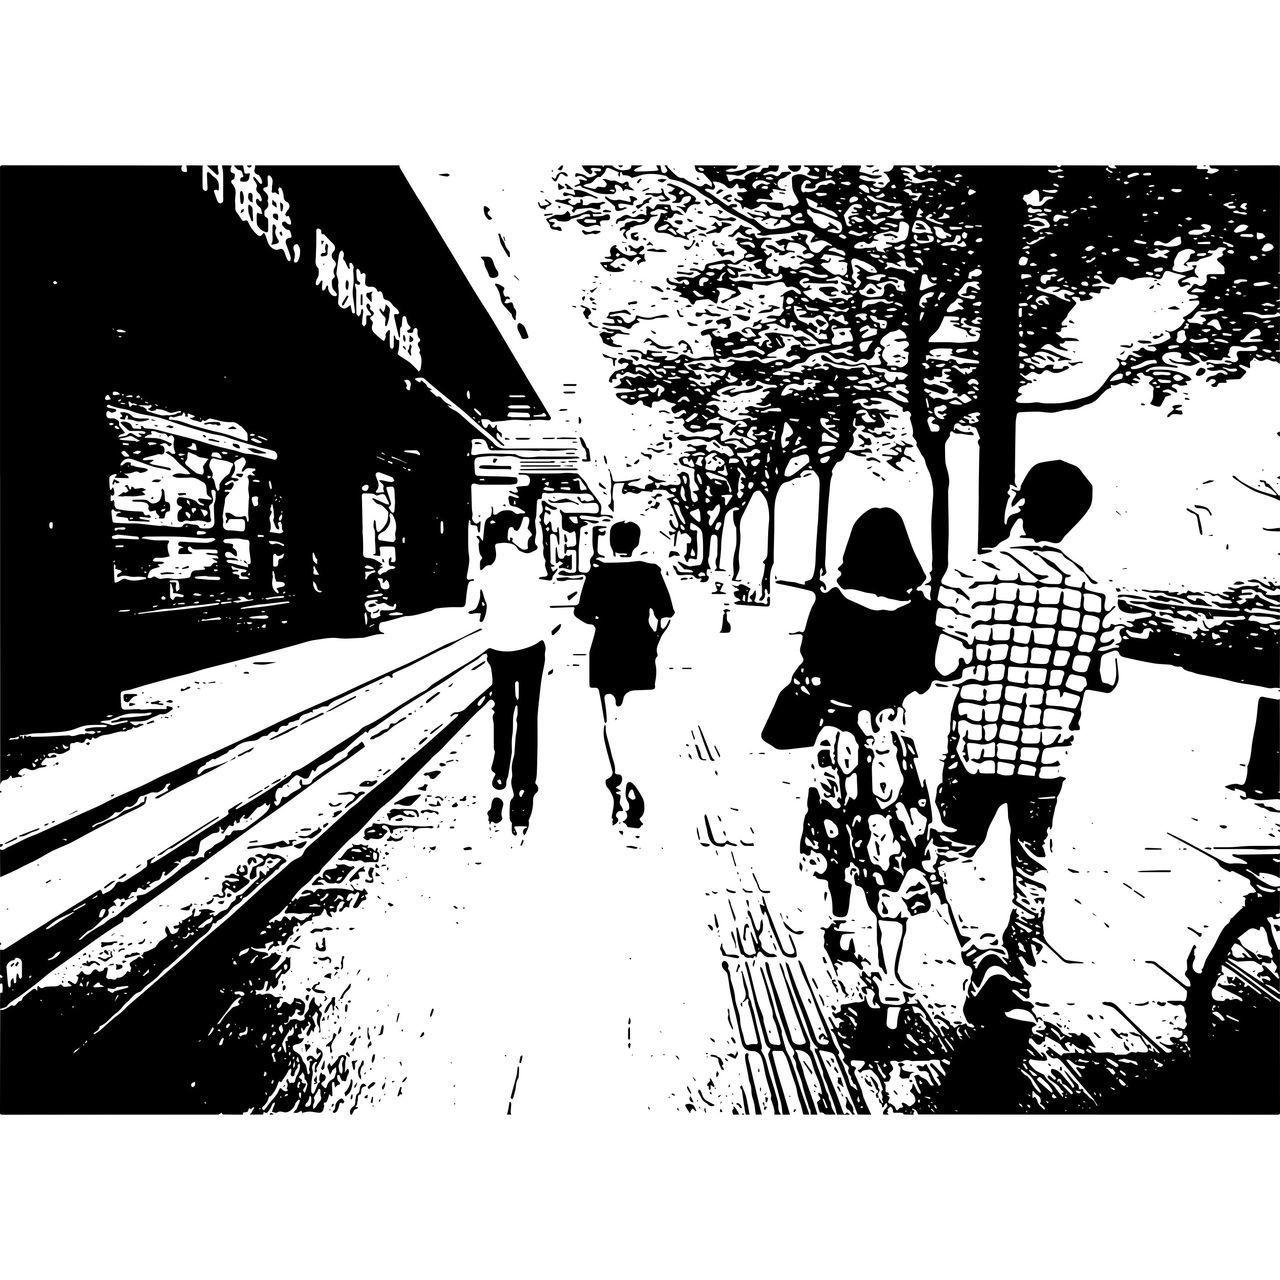 SILHOUETTE PEOPLE WALKING IN CITY